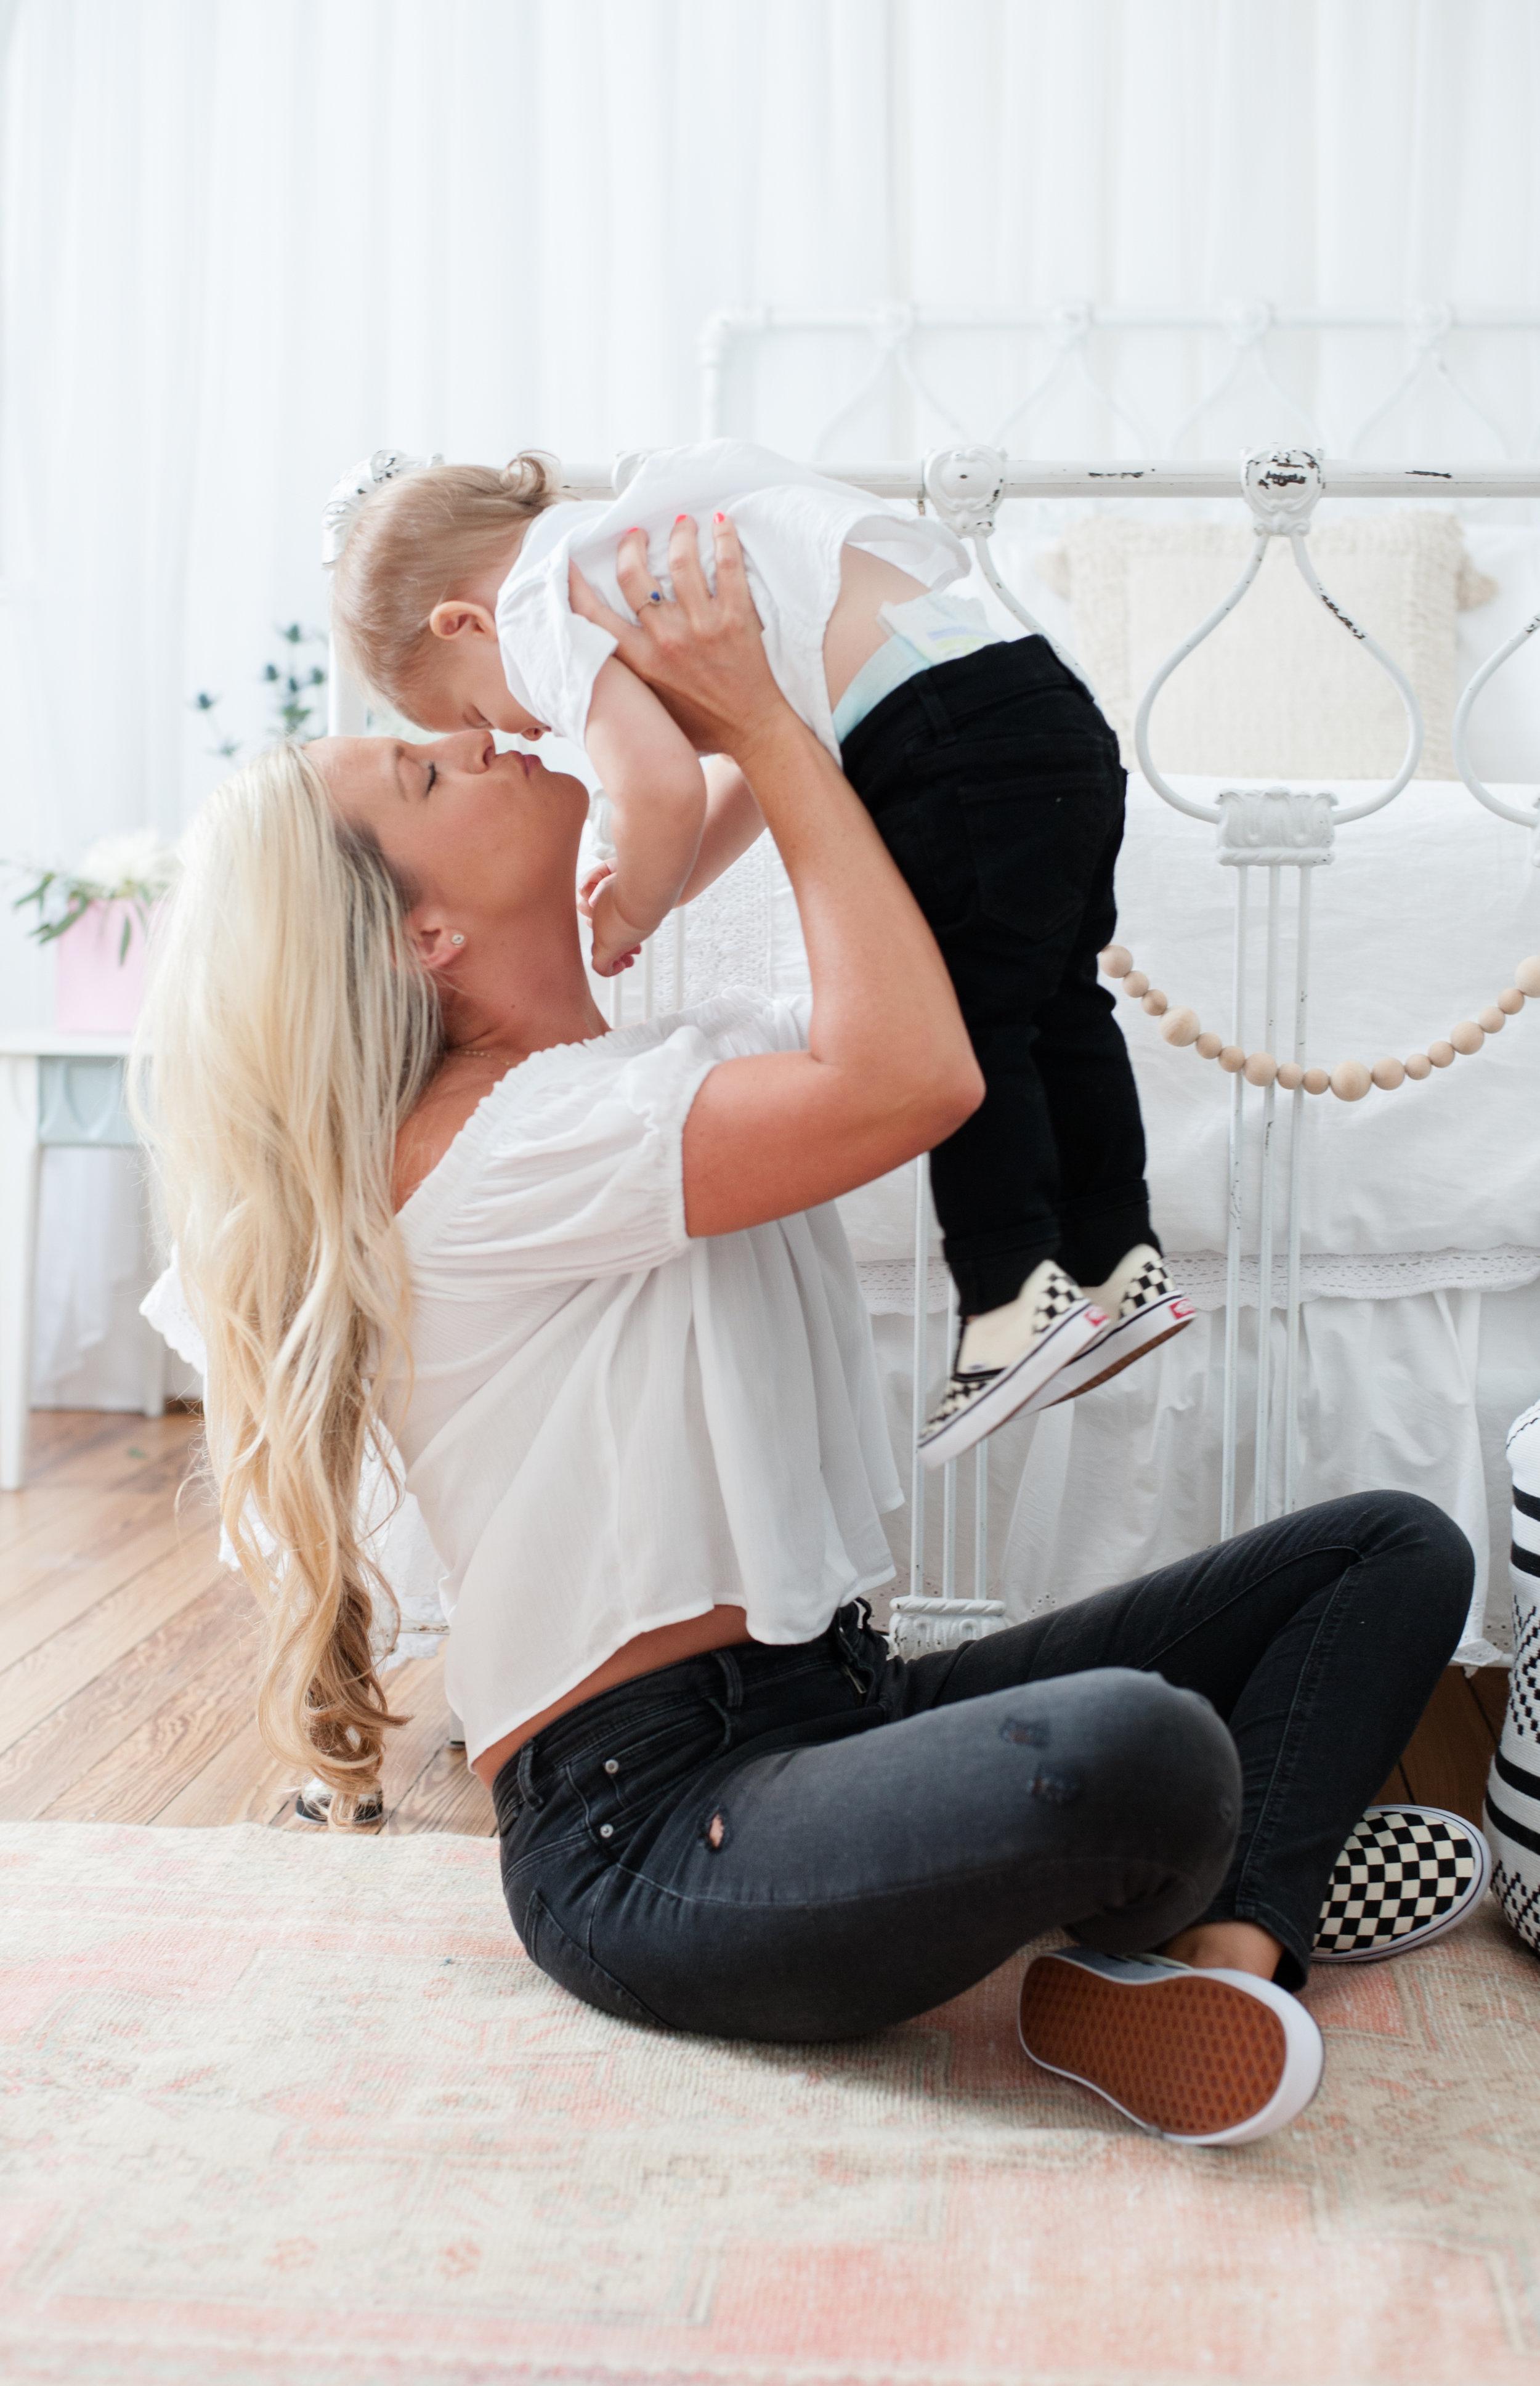 Berzinis-Mommy-and-Me-Portrait-2.jpg